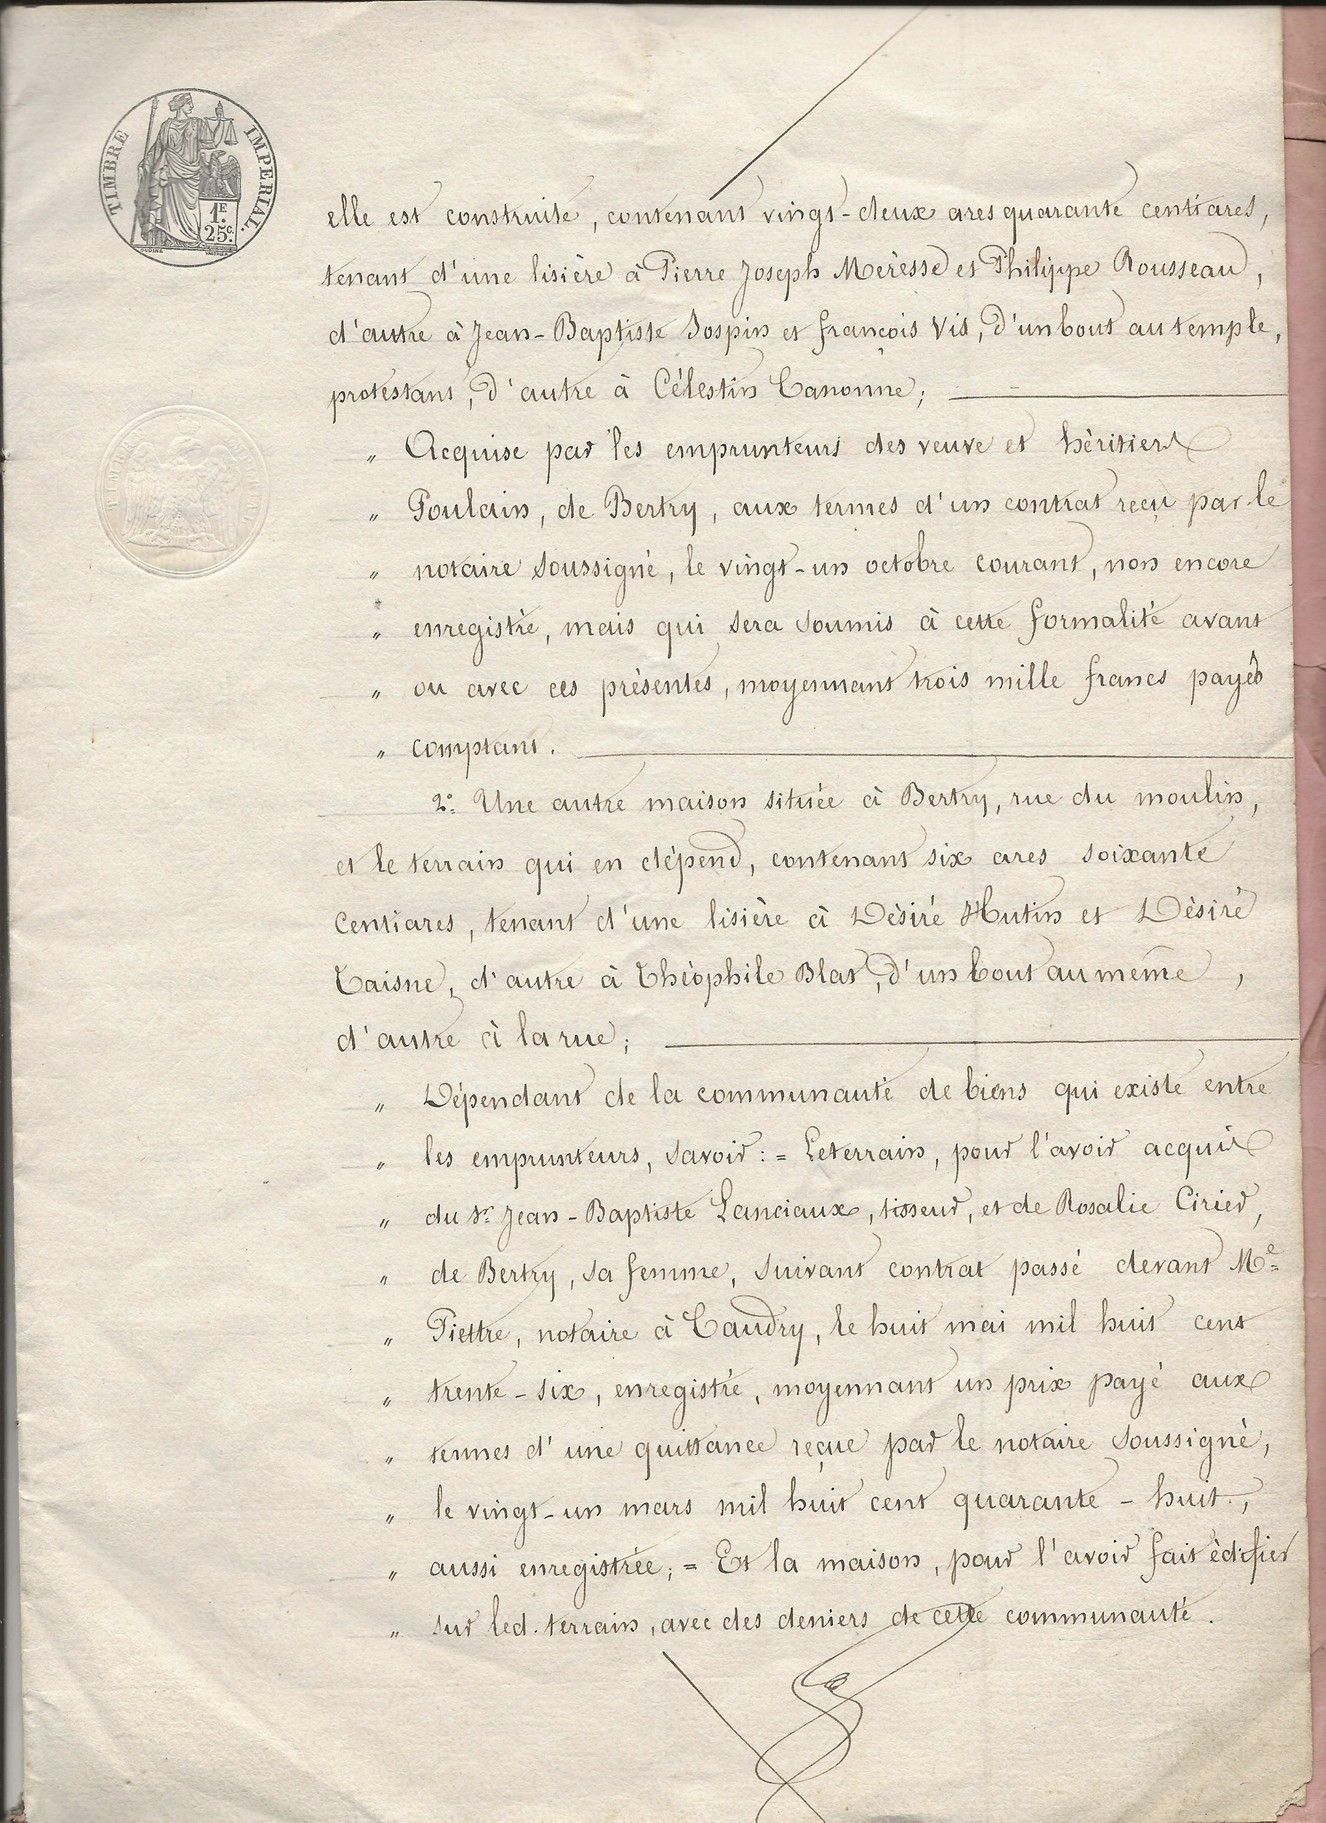 1854 emprunt hypothecaire jospin a leger plusquin 003